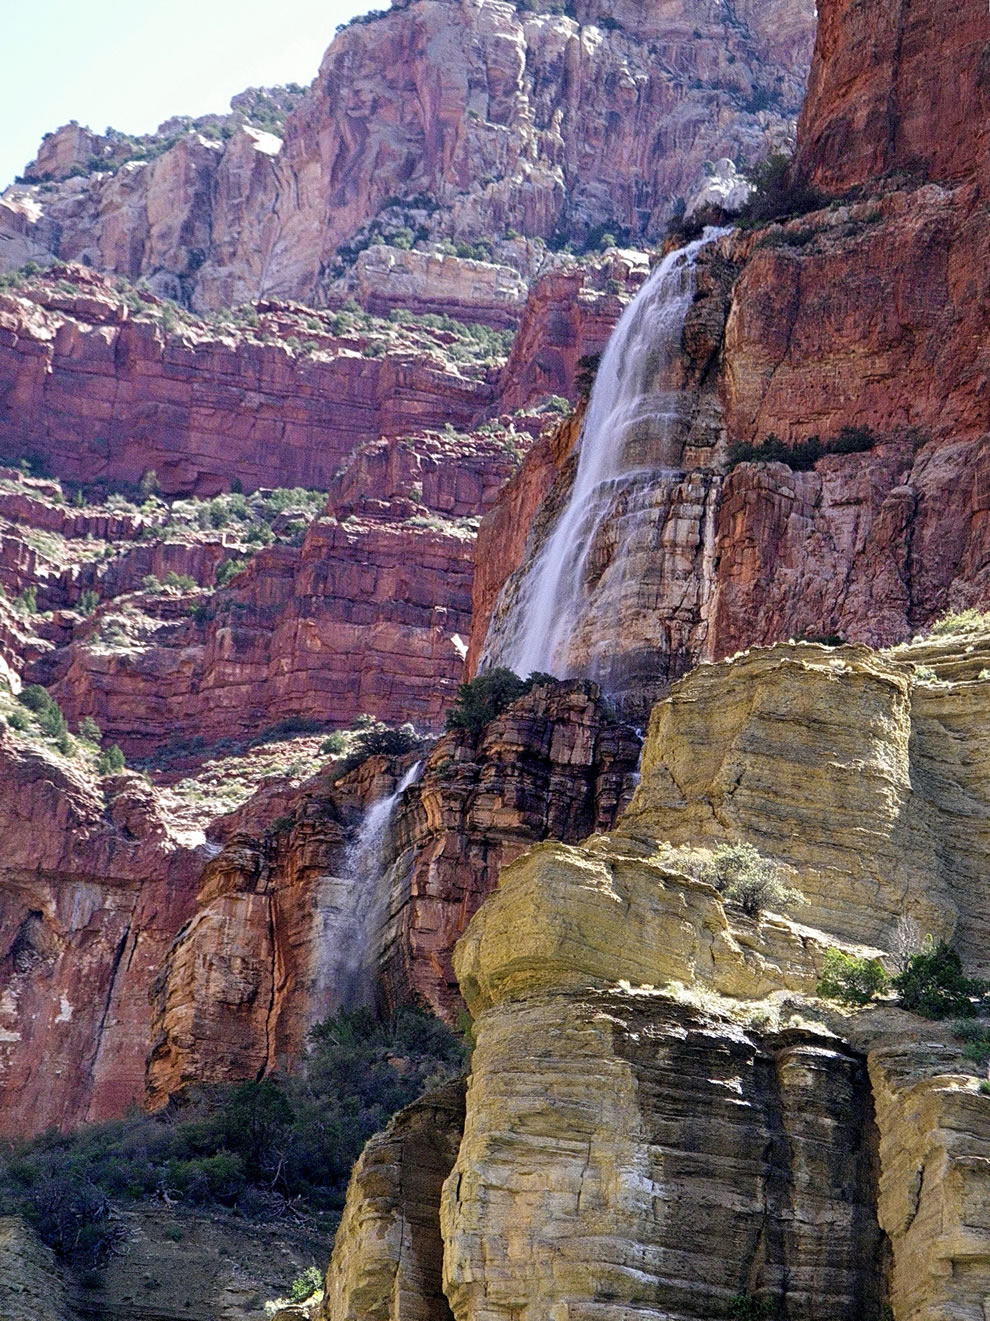 https://i1.wp.com/www.lovethesepics.com/wp-content/uploads/2011/03/Cheyava-Falls-upper-cascade-Grand-Canyon.jpg